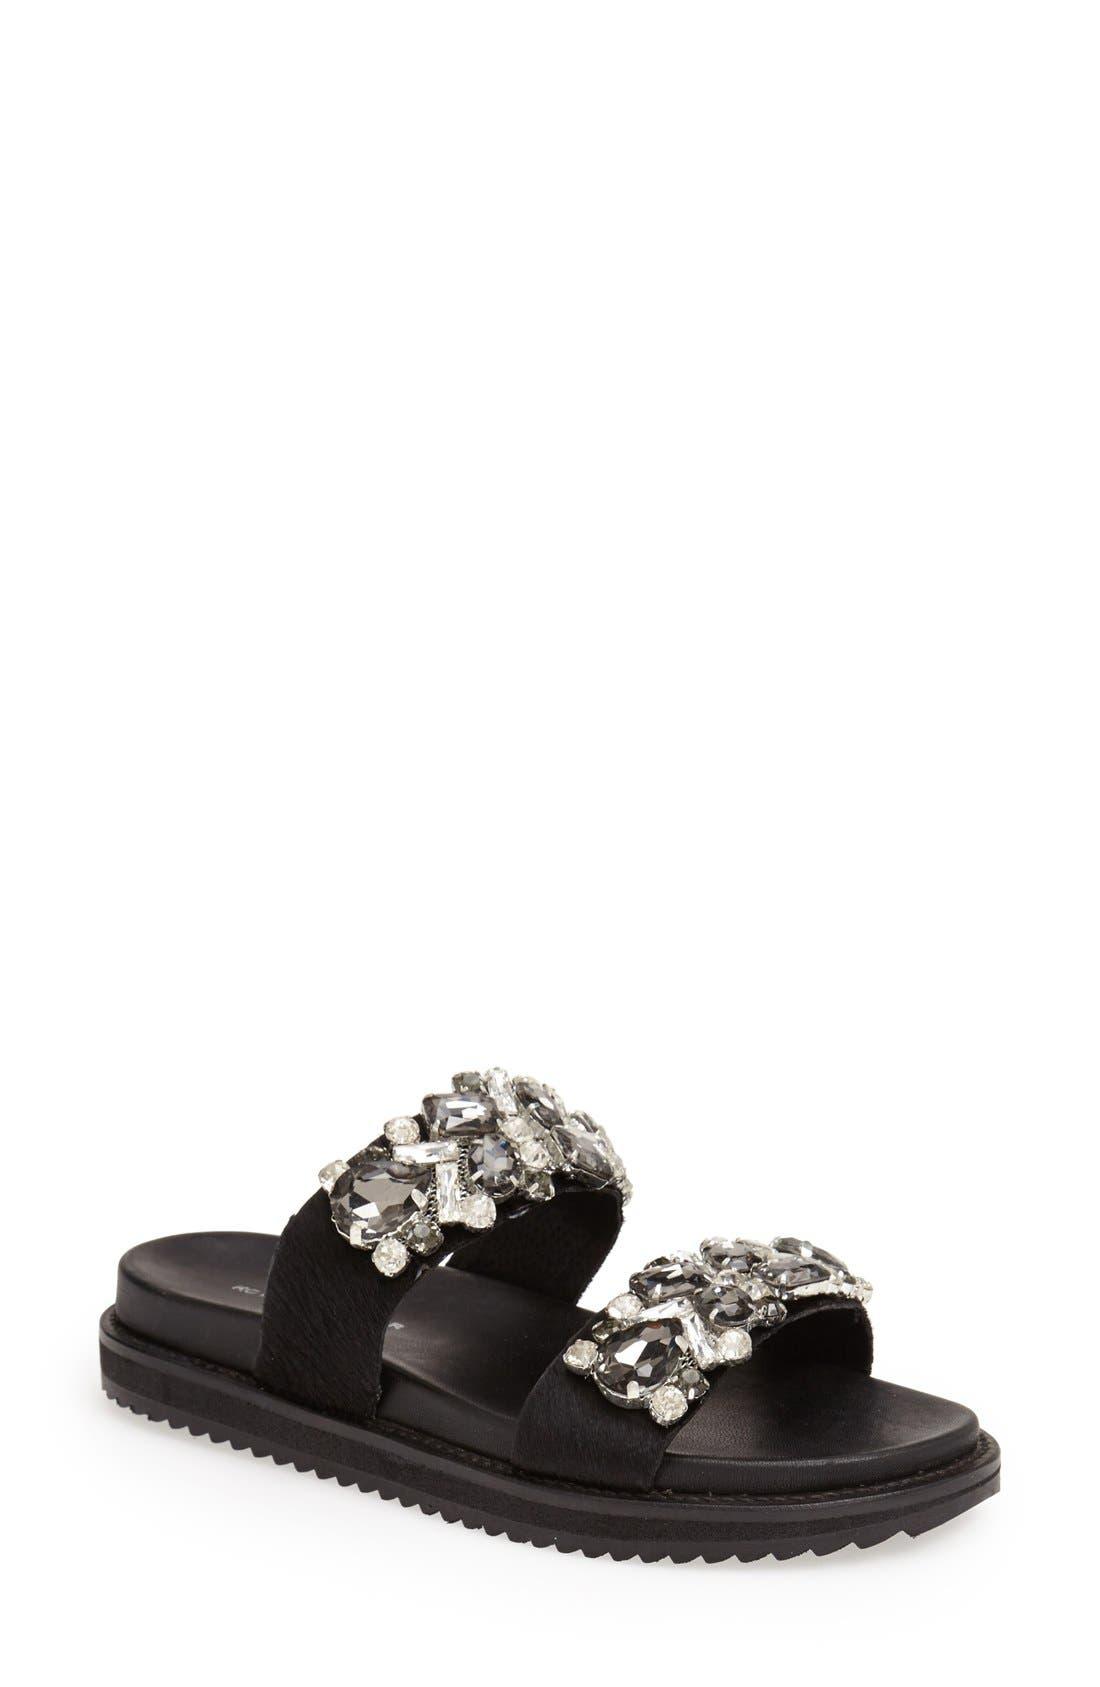 Main Image - KG Kurt Geiger 'Monarch' Embellished Calf Hair Slide Sandal (Women)